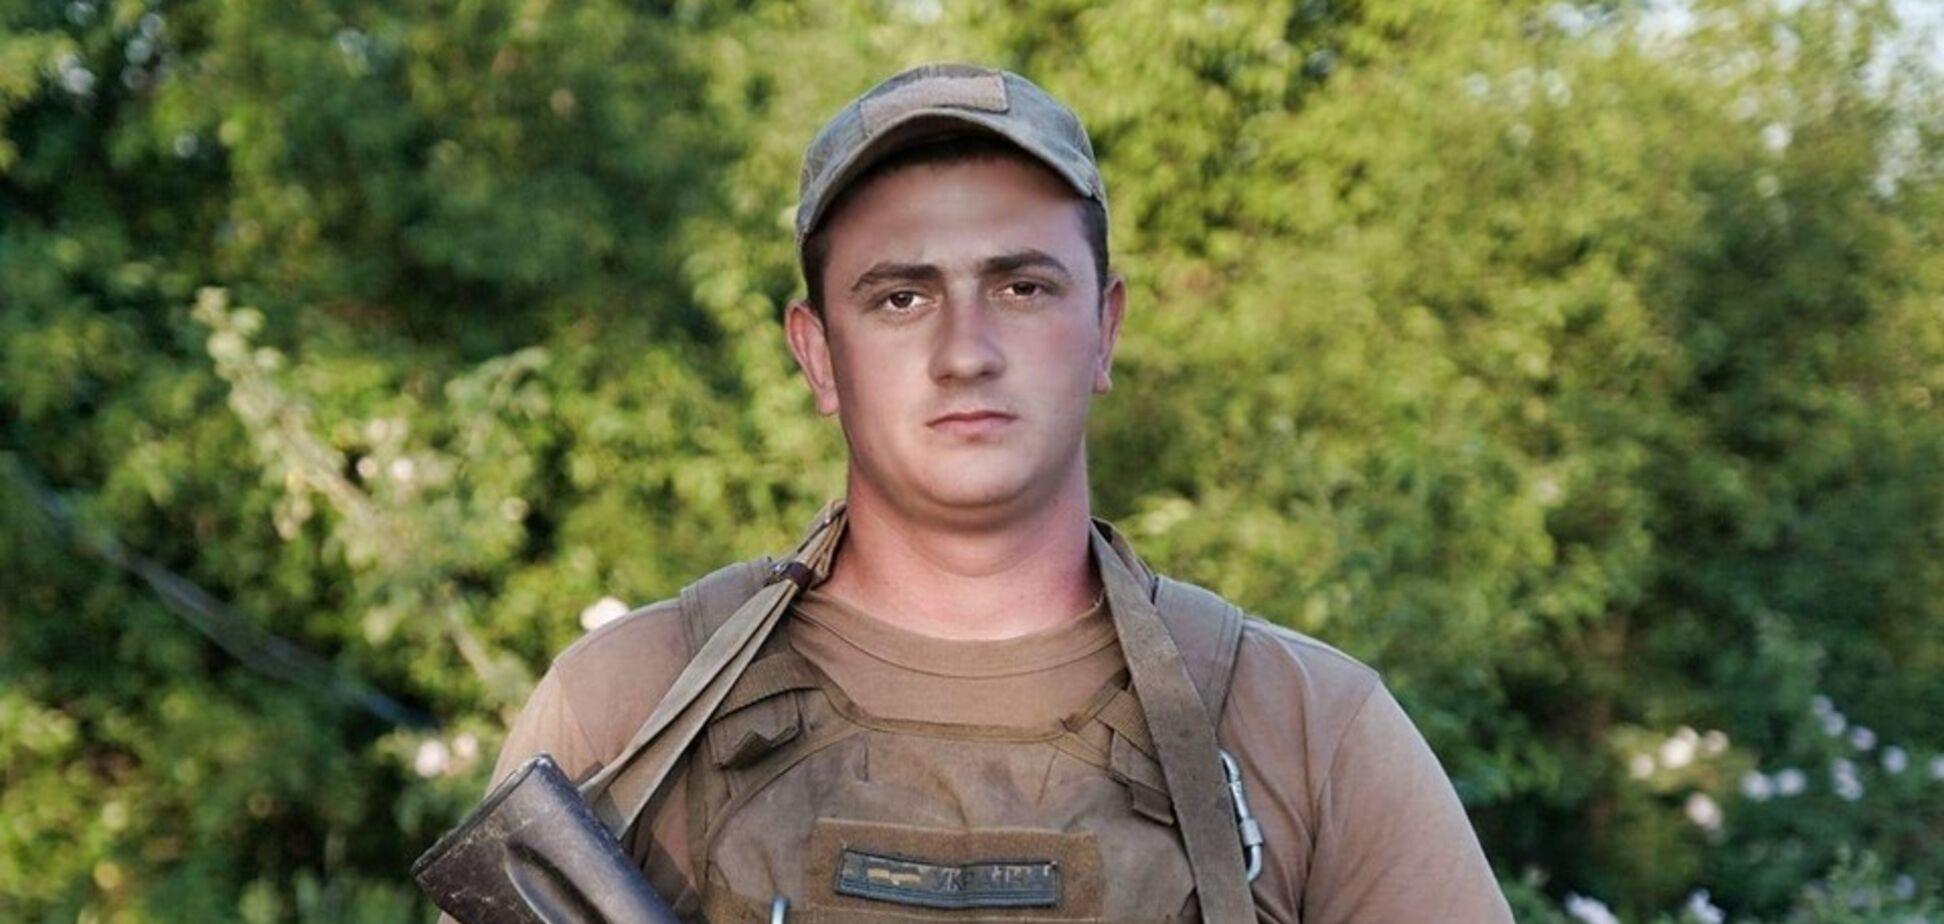 'Покойся с миром, воин': в зоне ООС погиб 24-летний морпех